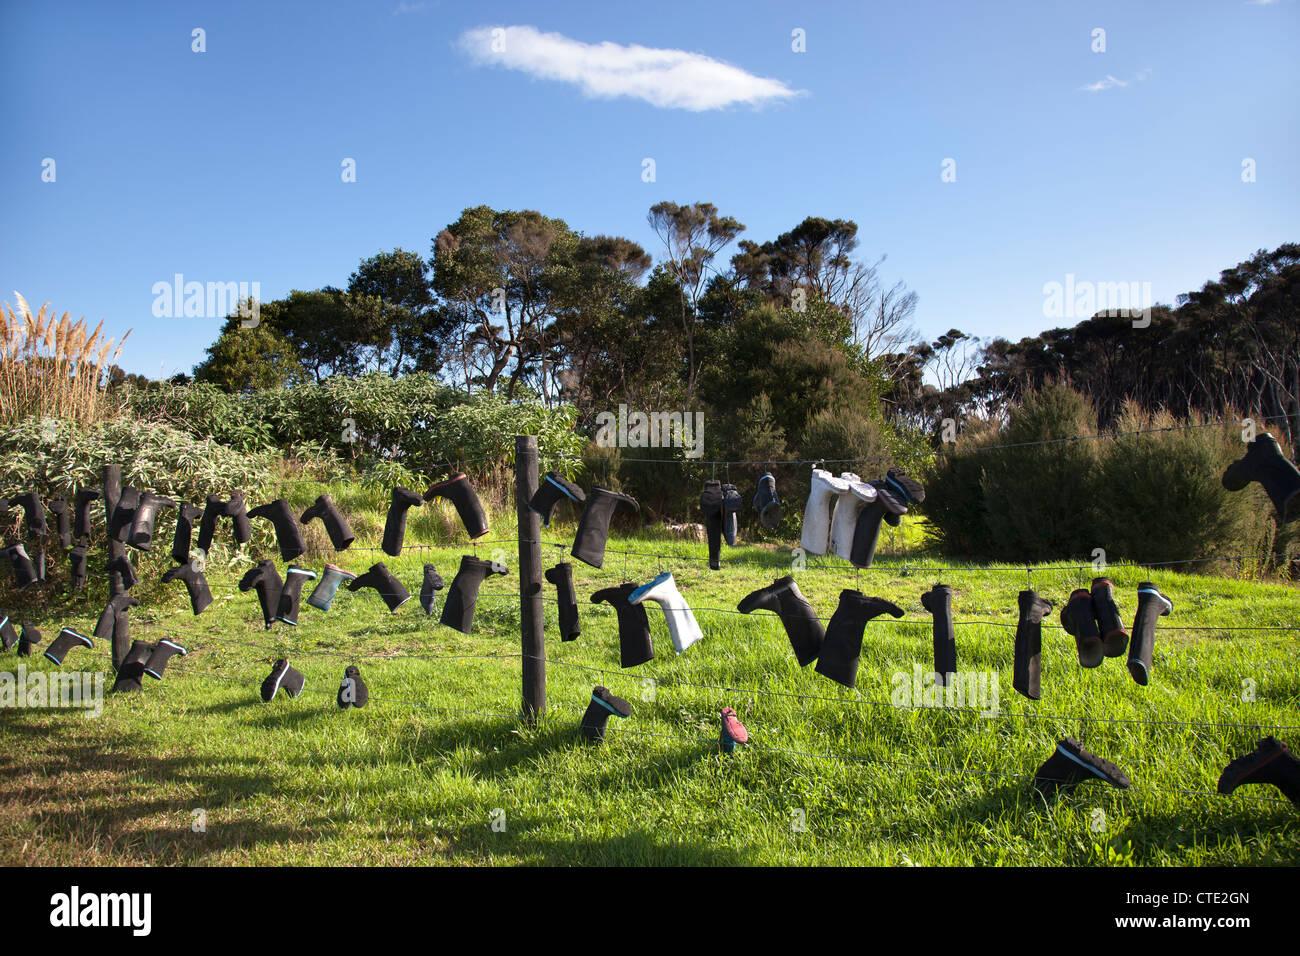 New Zealand Shoes On Fence